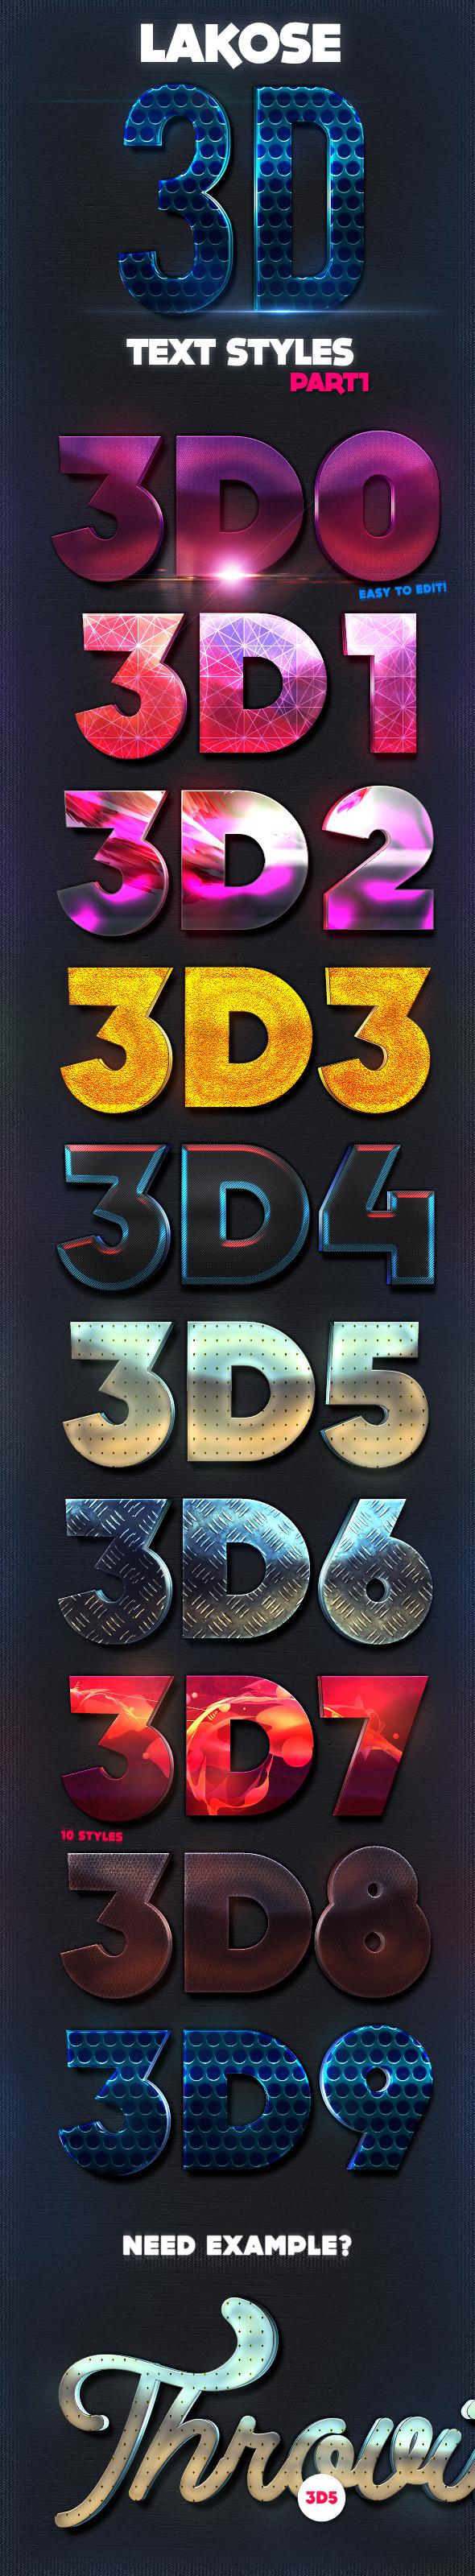 Lakose 3D Text Styles Part 1 - Text Effects Styles